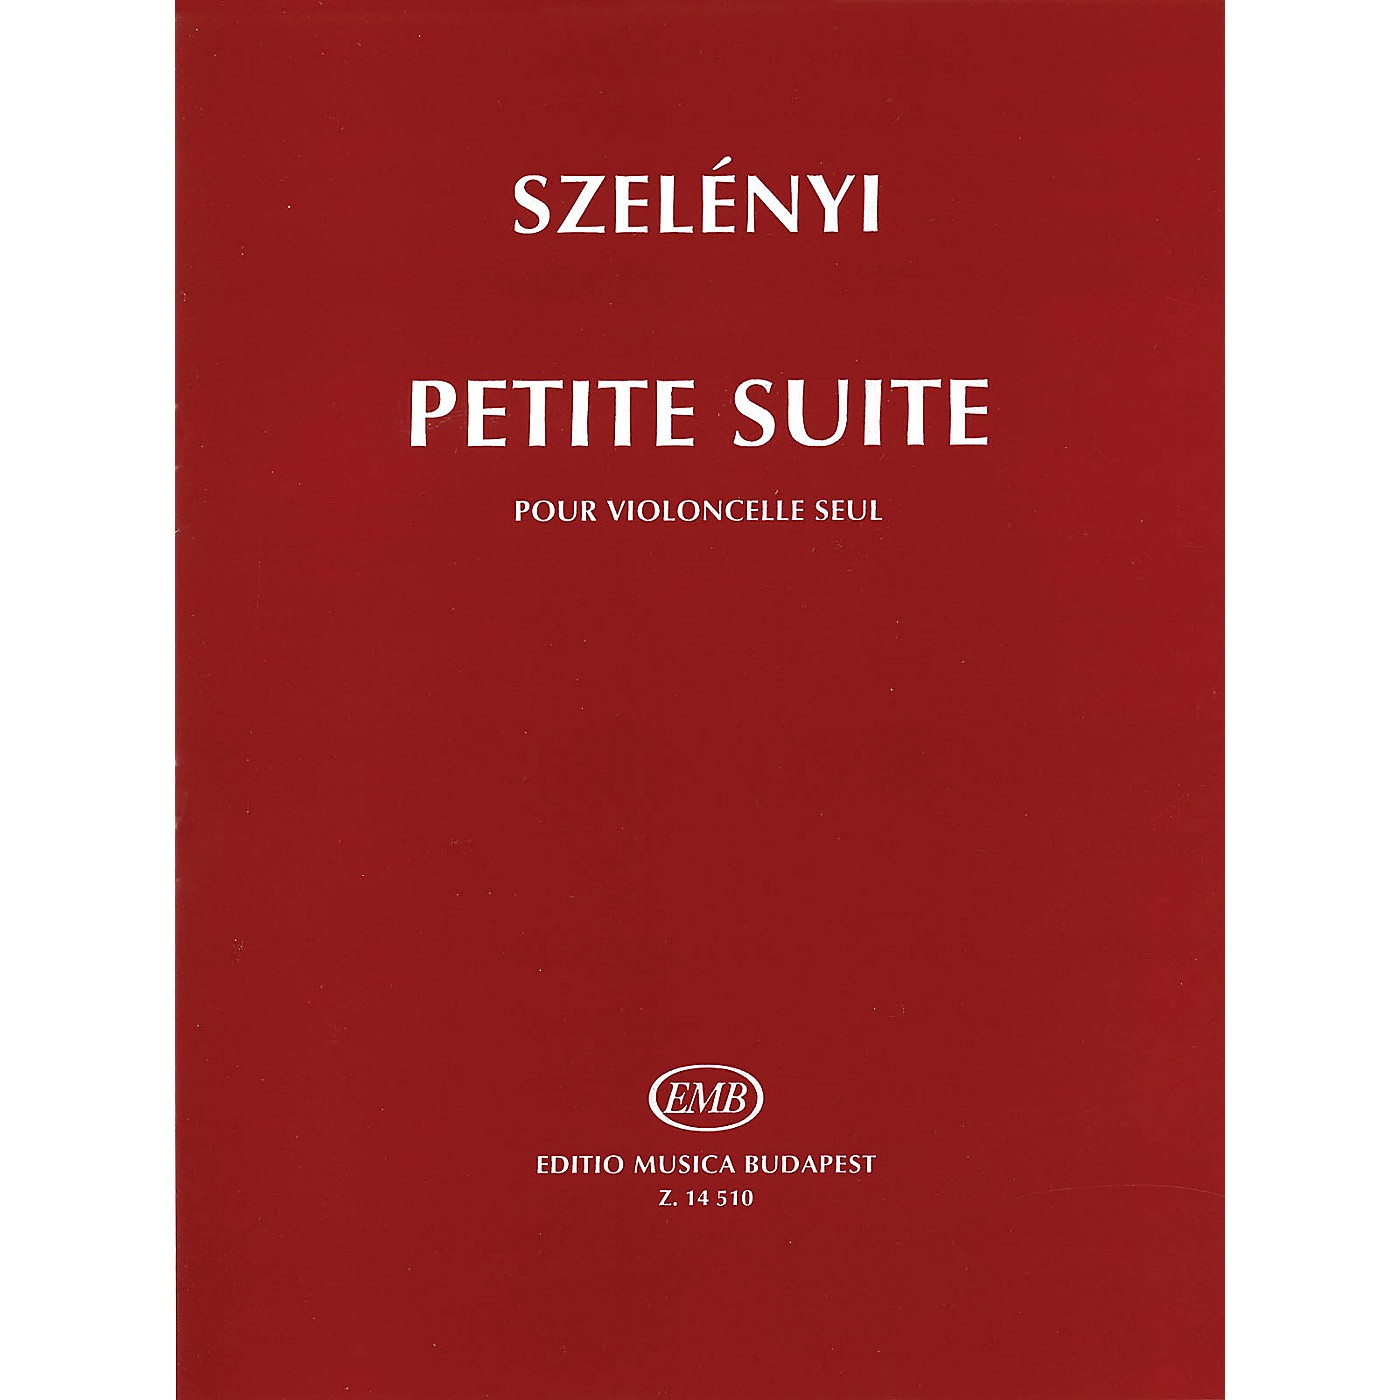 Editio Musica Budapest Petite Suite (for Solo Violoncello) EMB Series Written by István Szelényi thumbnail